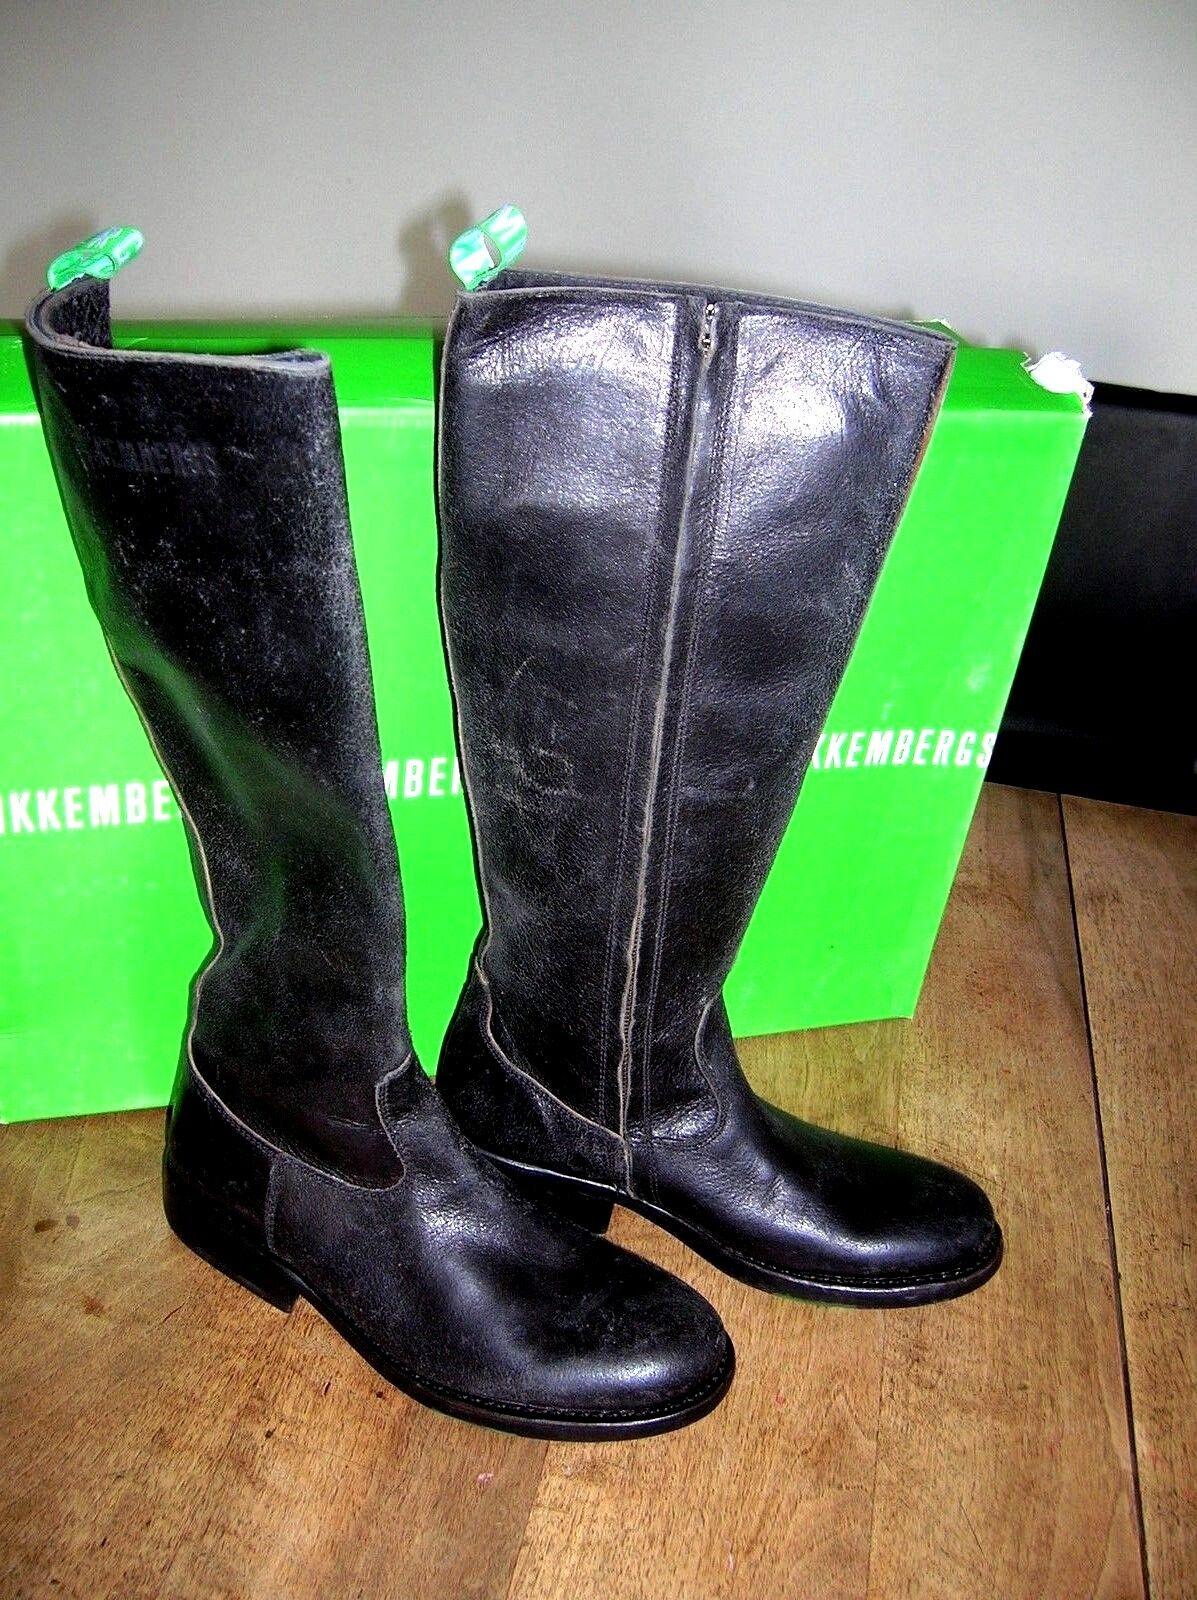 Zapatos especiales con descuento BIKKEMBERGS Black horse black vintage NEUVE Valeur 365E Pointure,37.